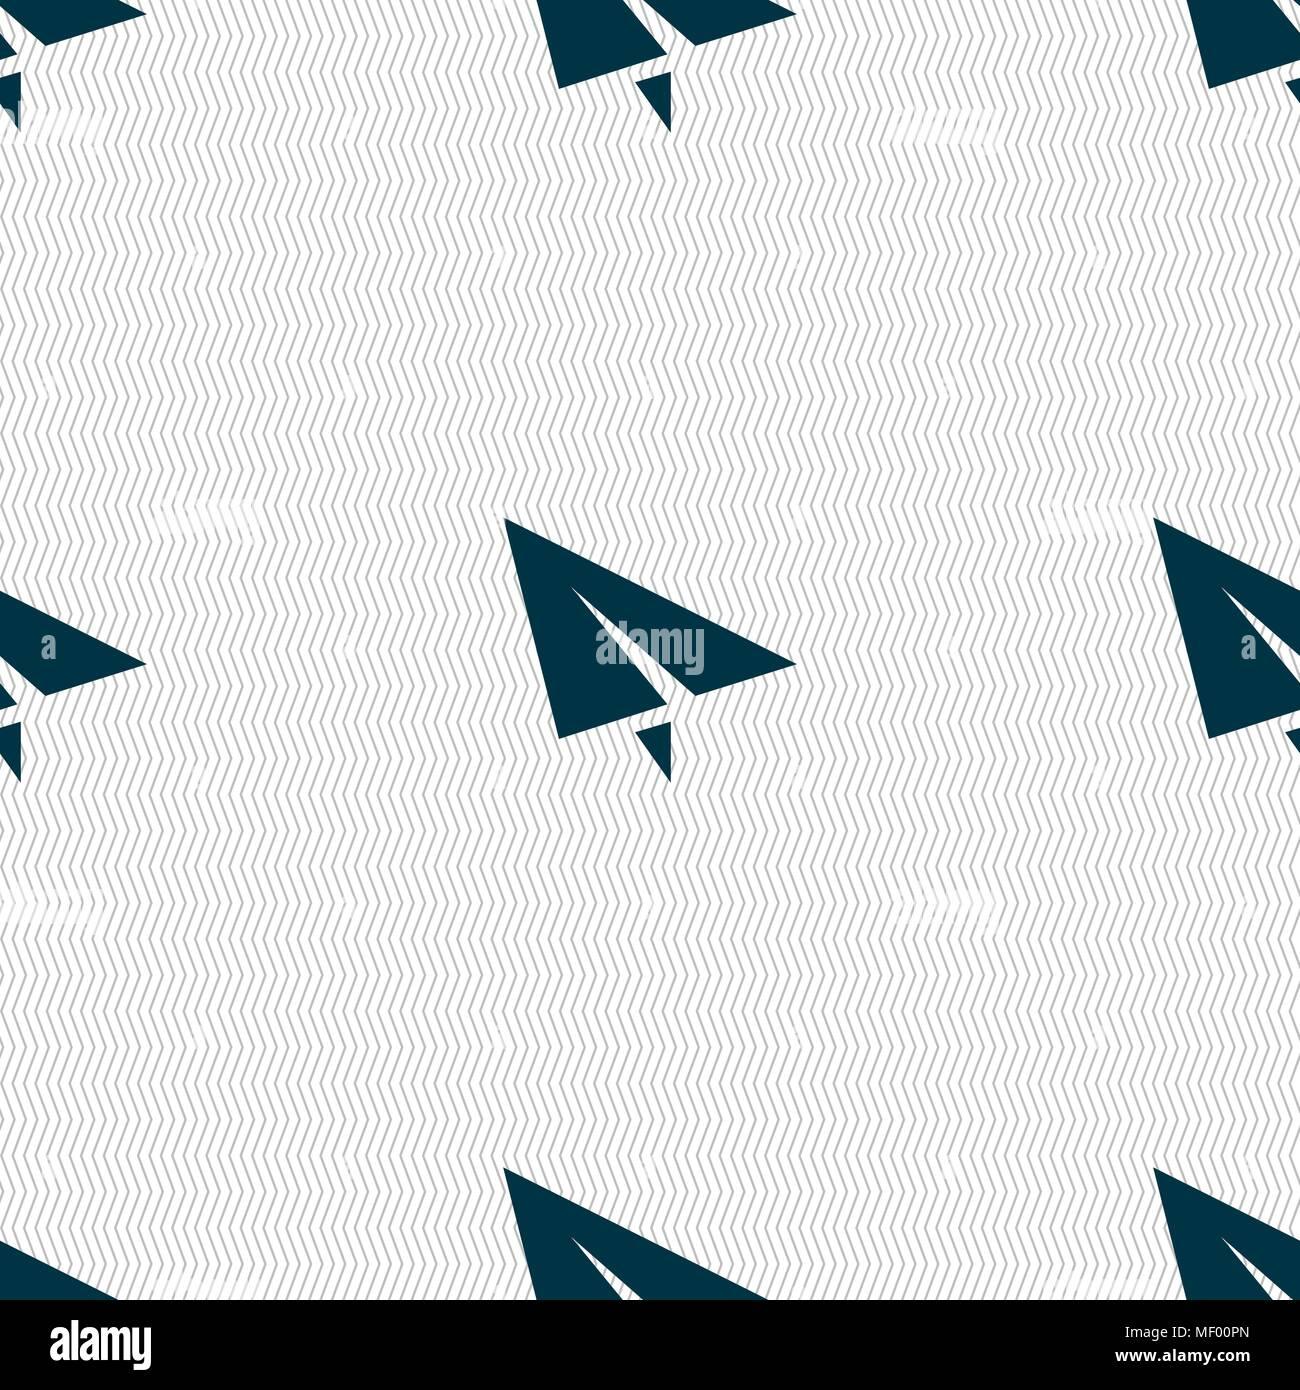 Paper Plane Origami Icon Vector Stockfotos & Paper Plane Origami ...